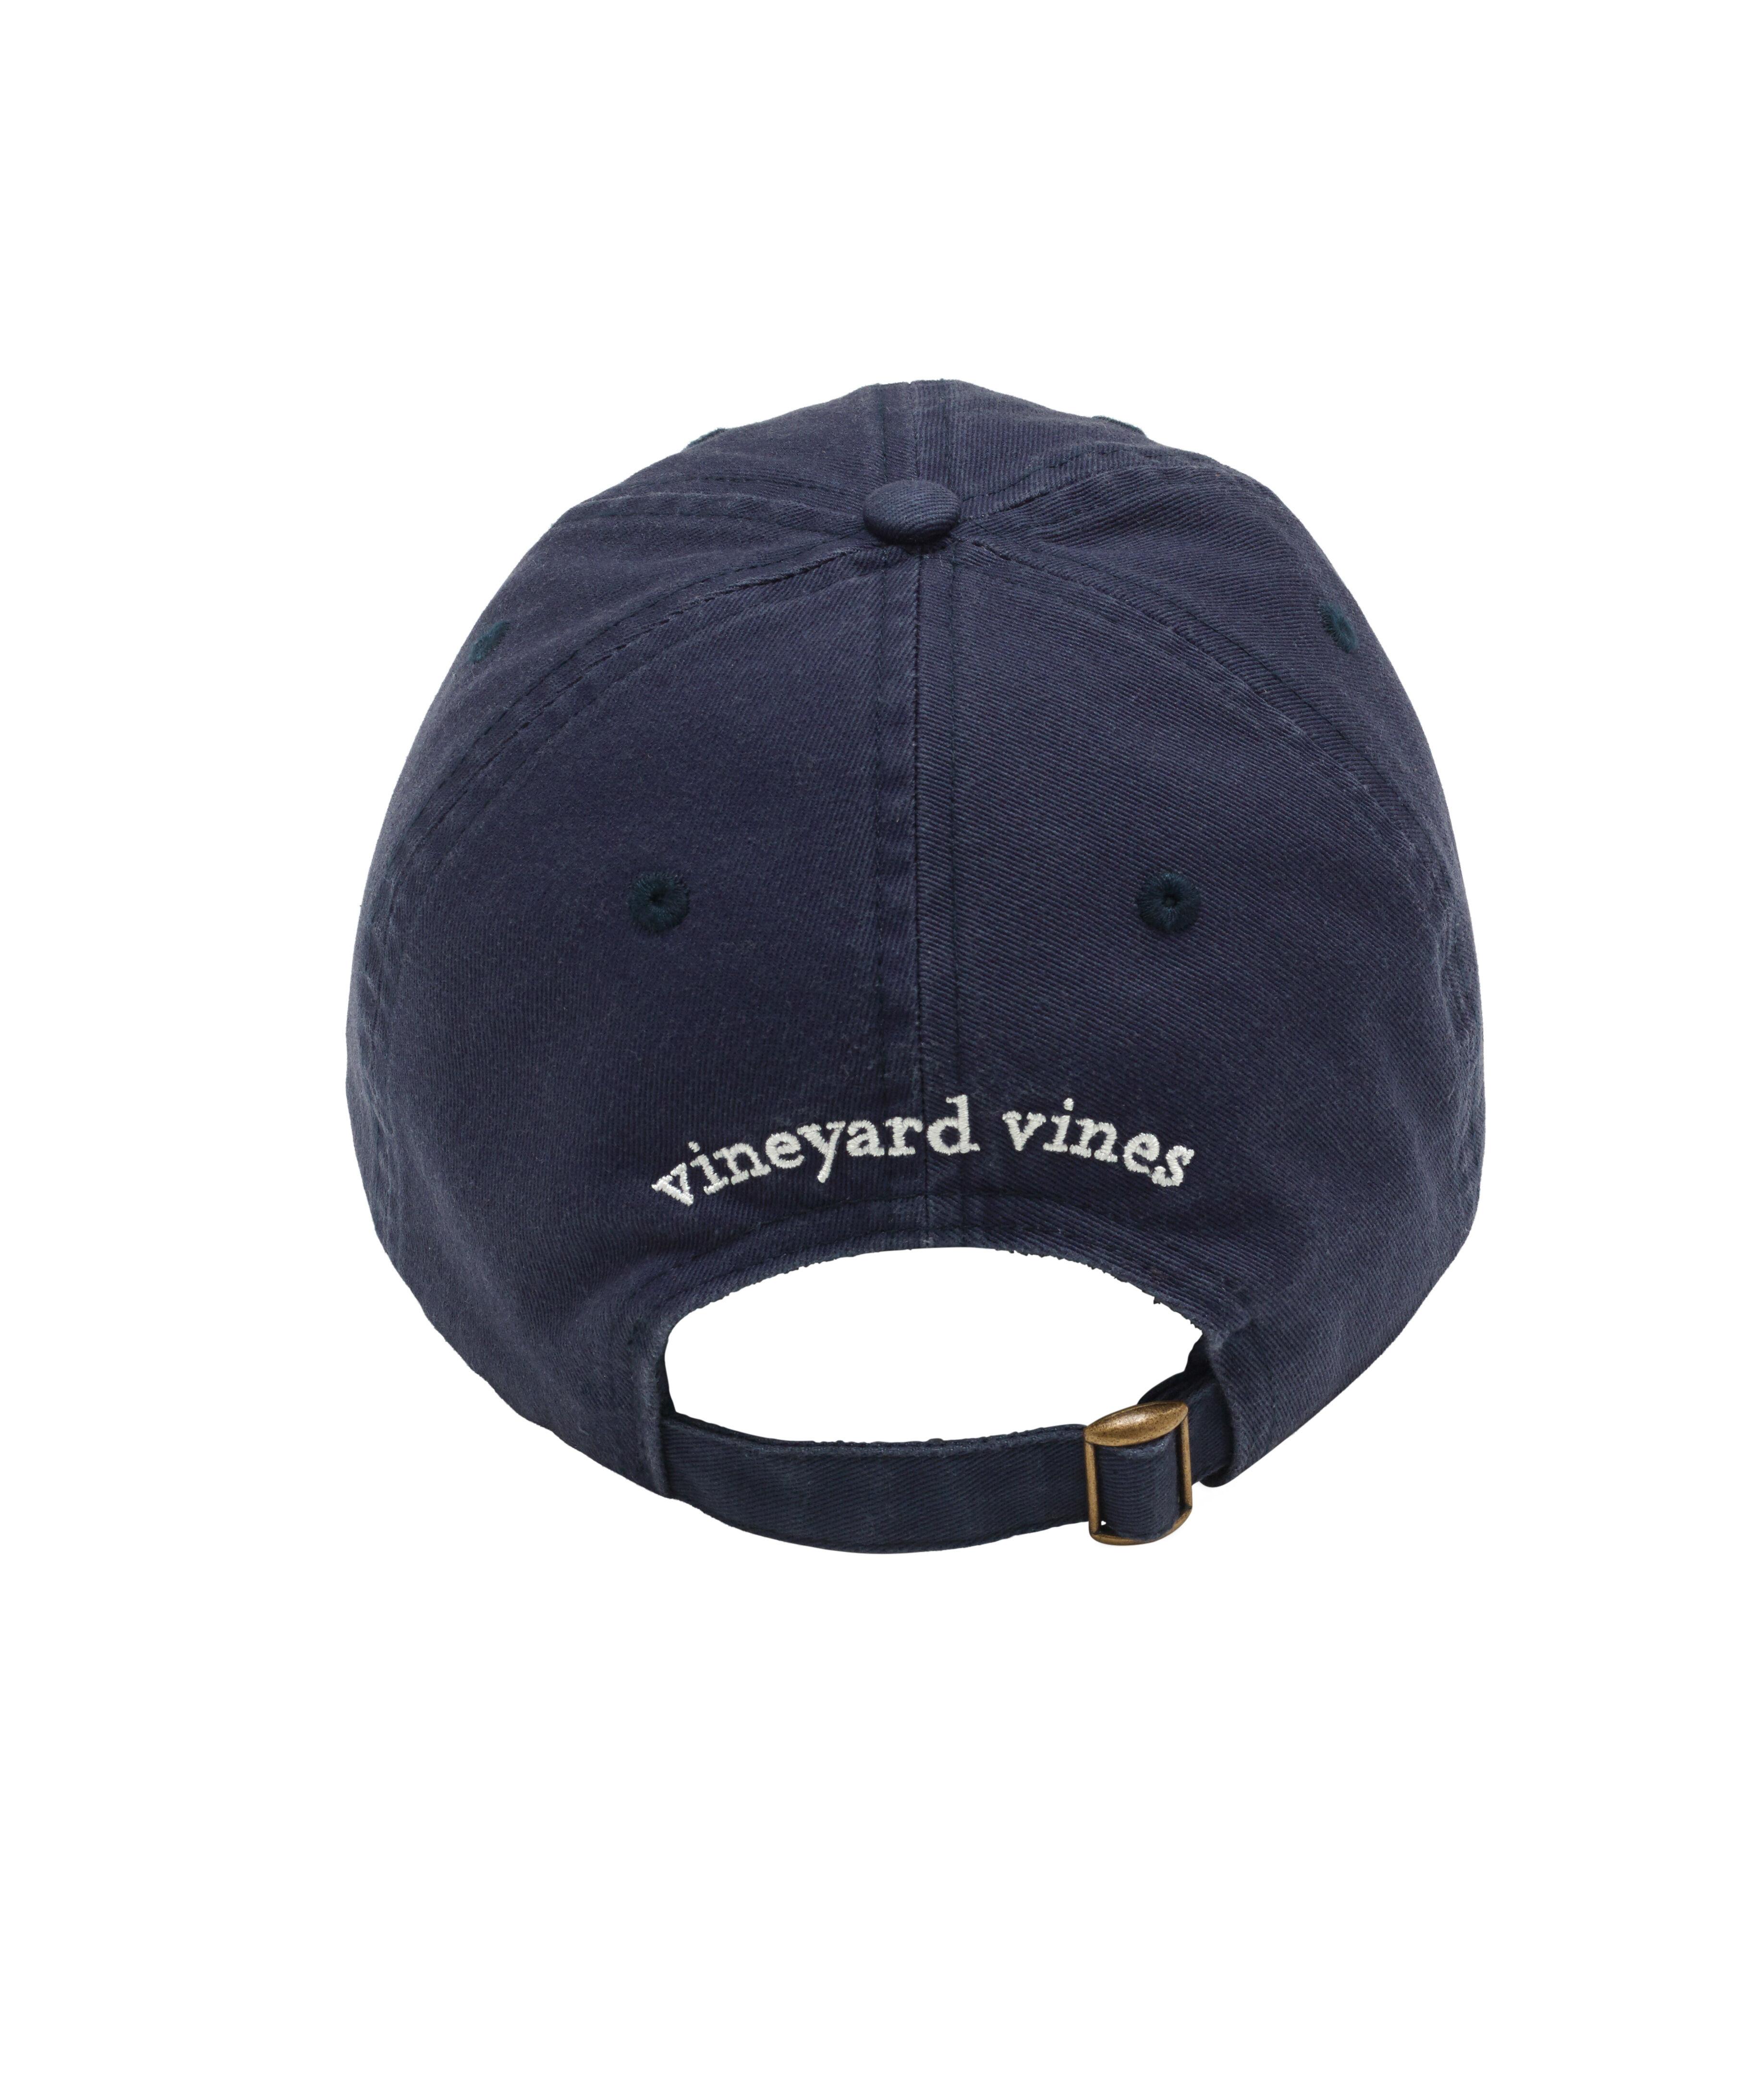 Men's Hats Apparel Accessories Strict Filipino Flag Adult Adjustable Denim Cotton Dad Hat Baseball Caps